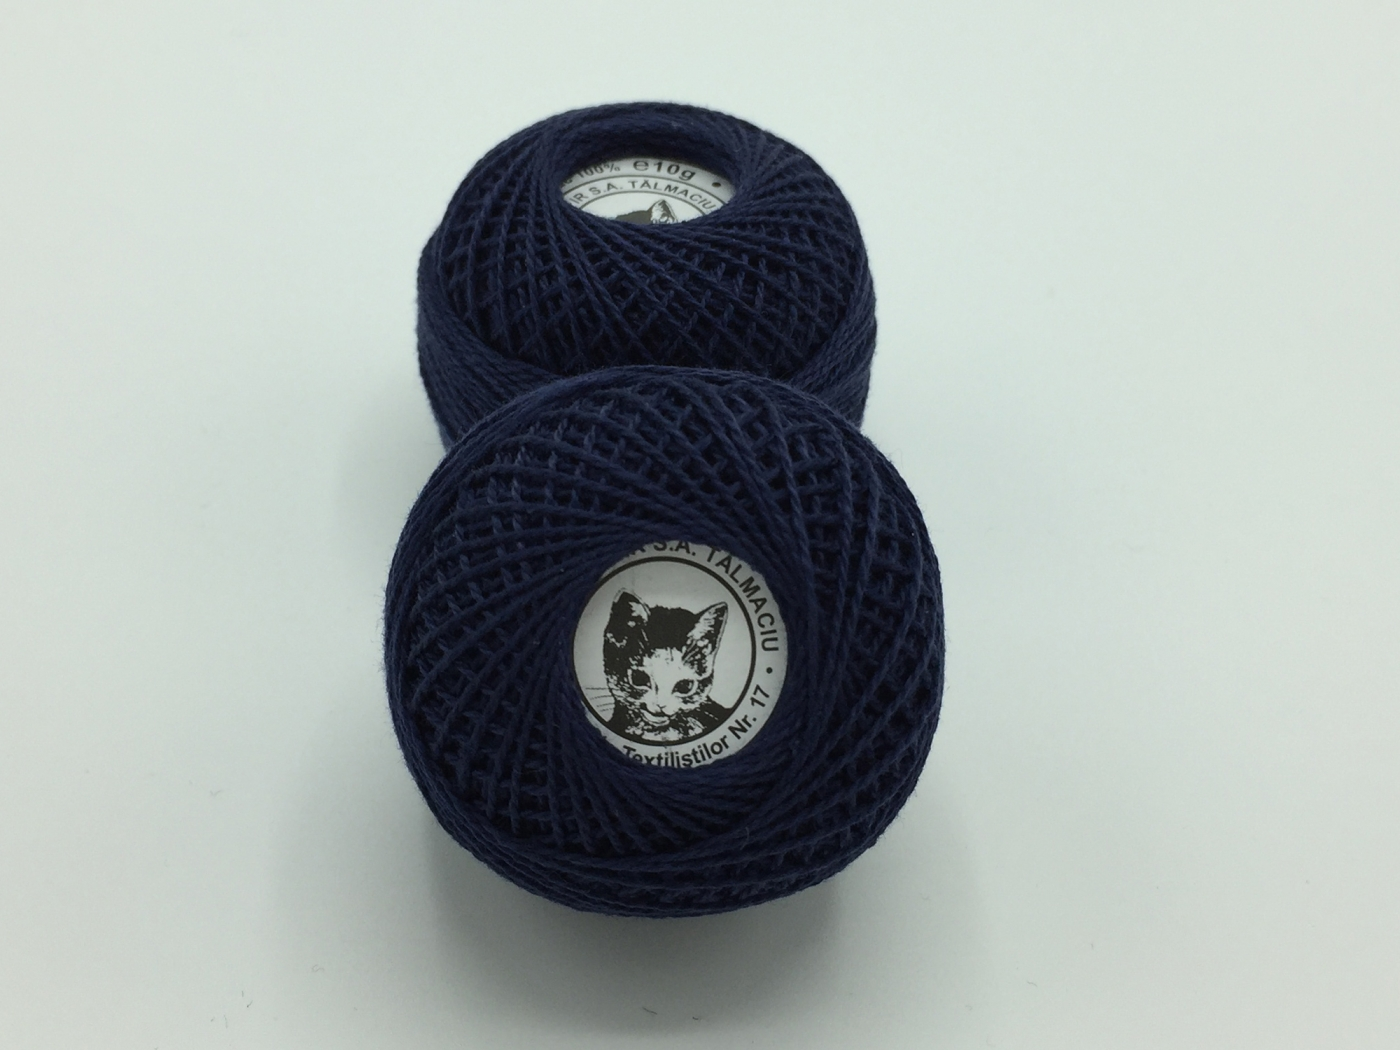 Ata cotton-perle 100% bumbac - Bleumarin - 10 gheme - Romanofir 20/2